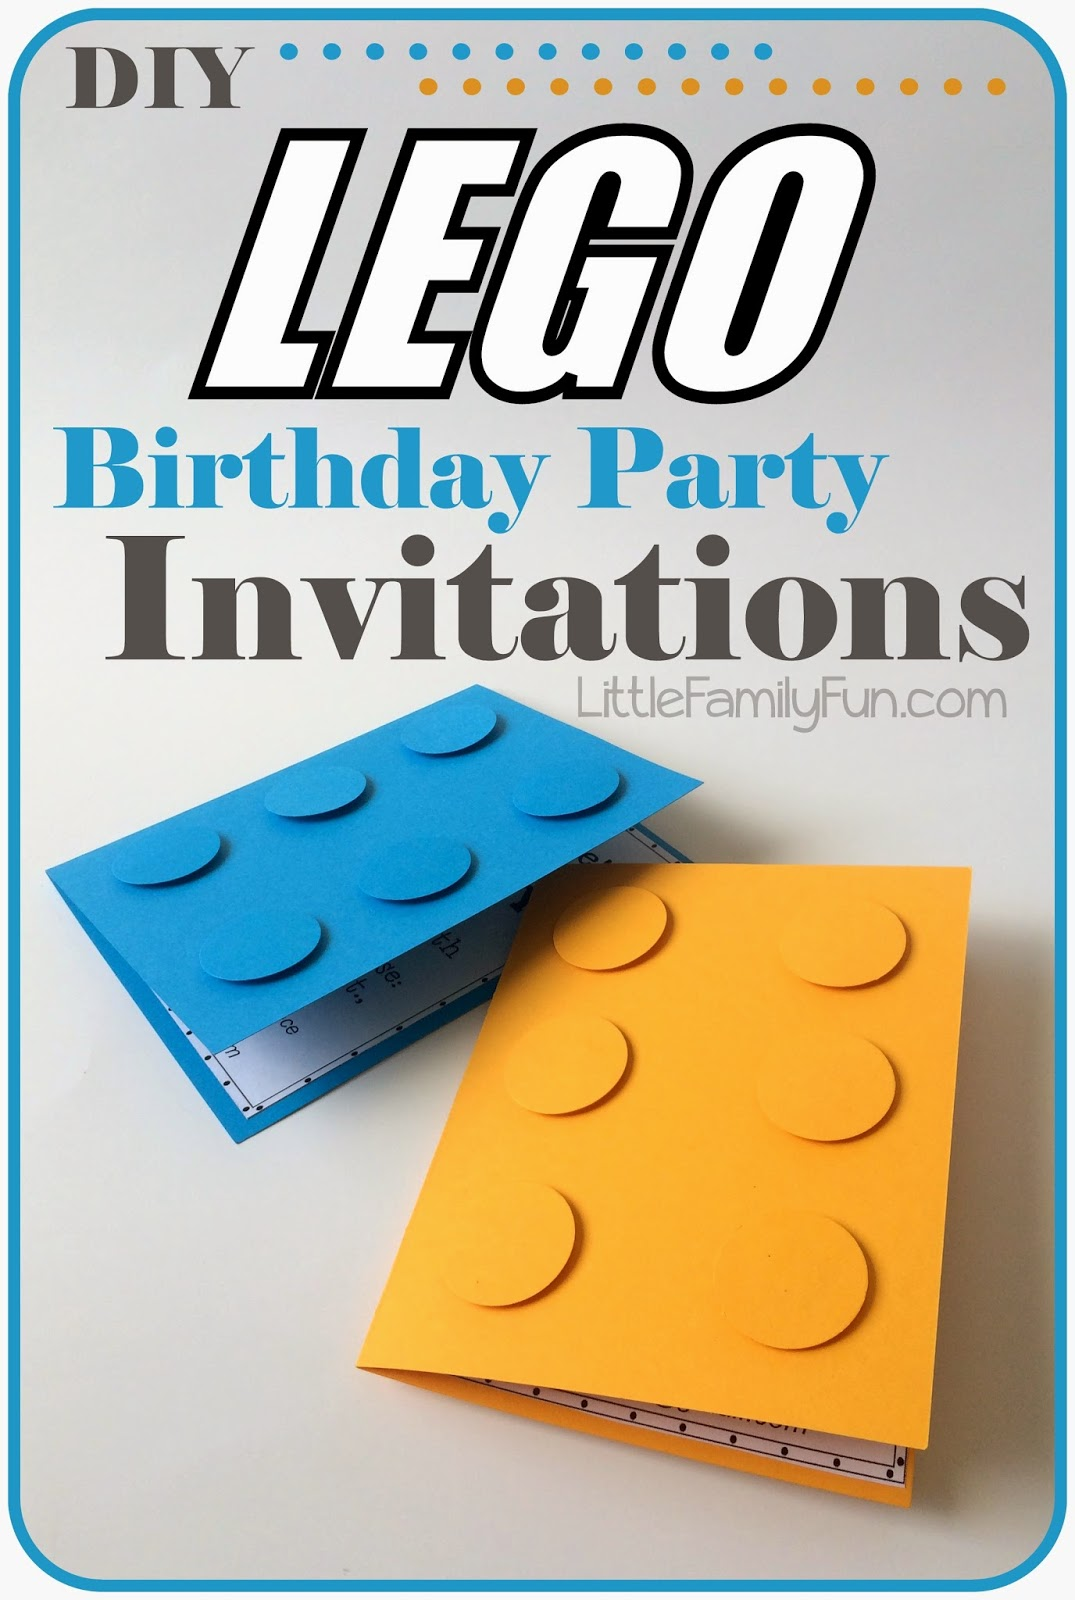 http://www.littlefamilyfun.com/2014/03/lego-party-invitations.html